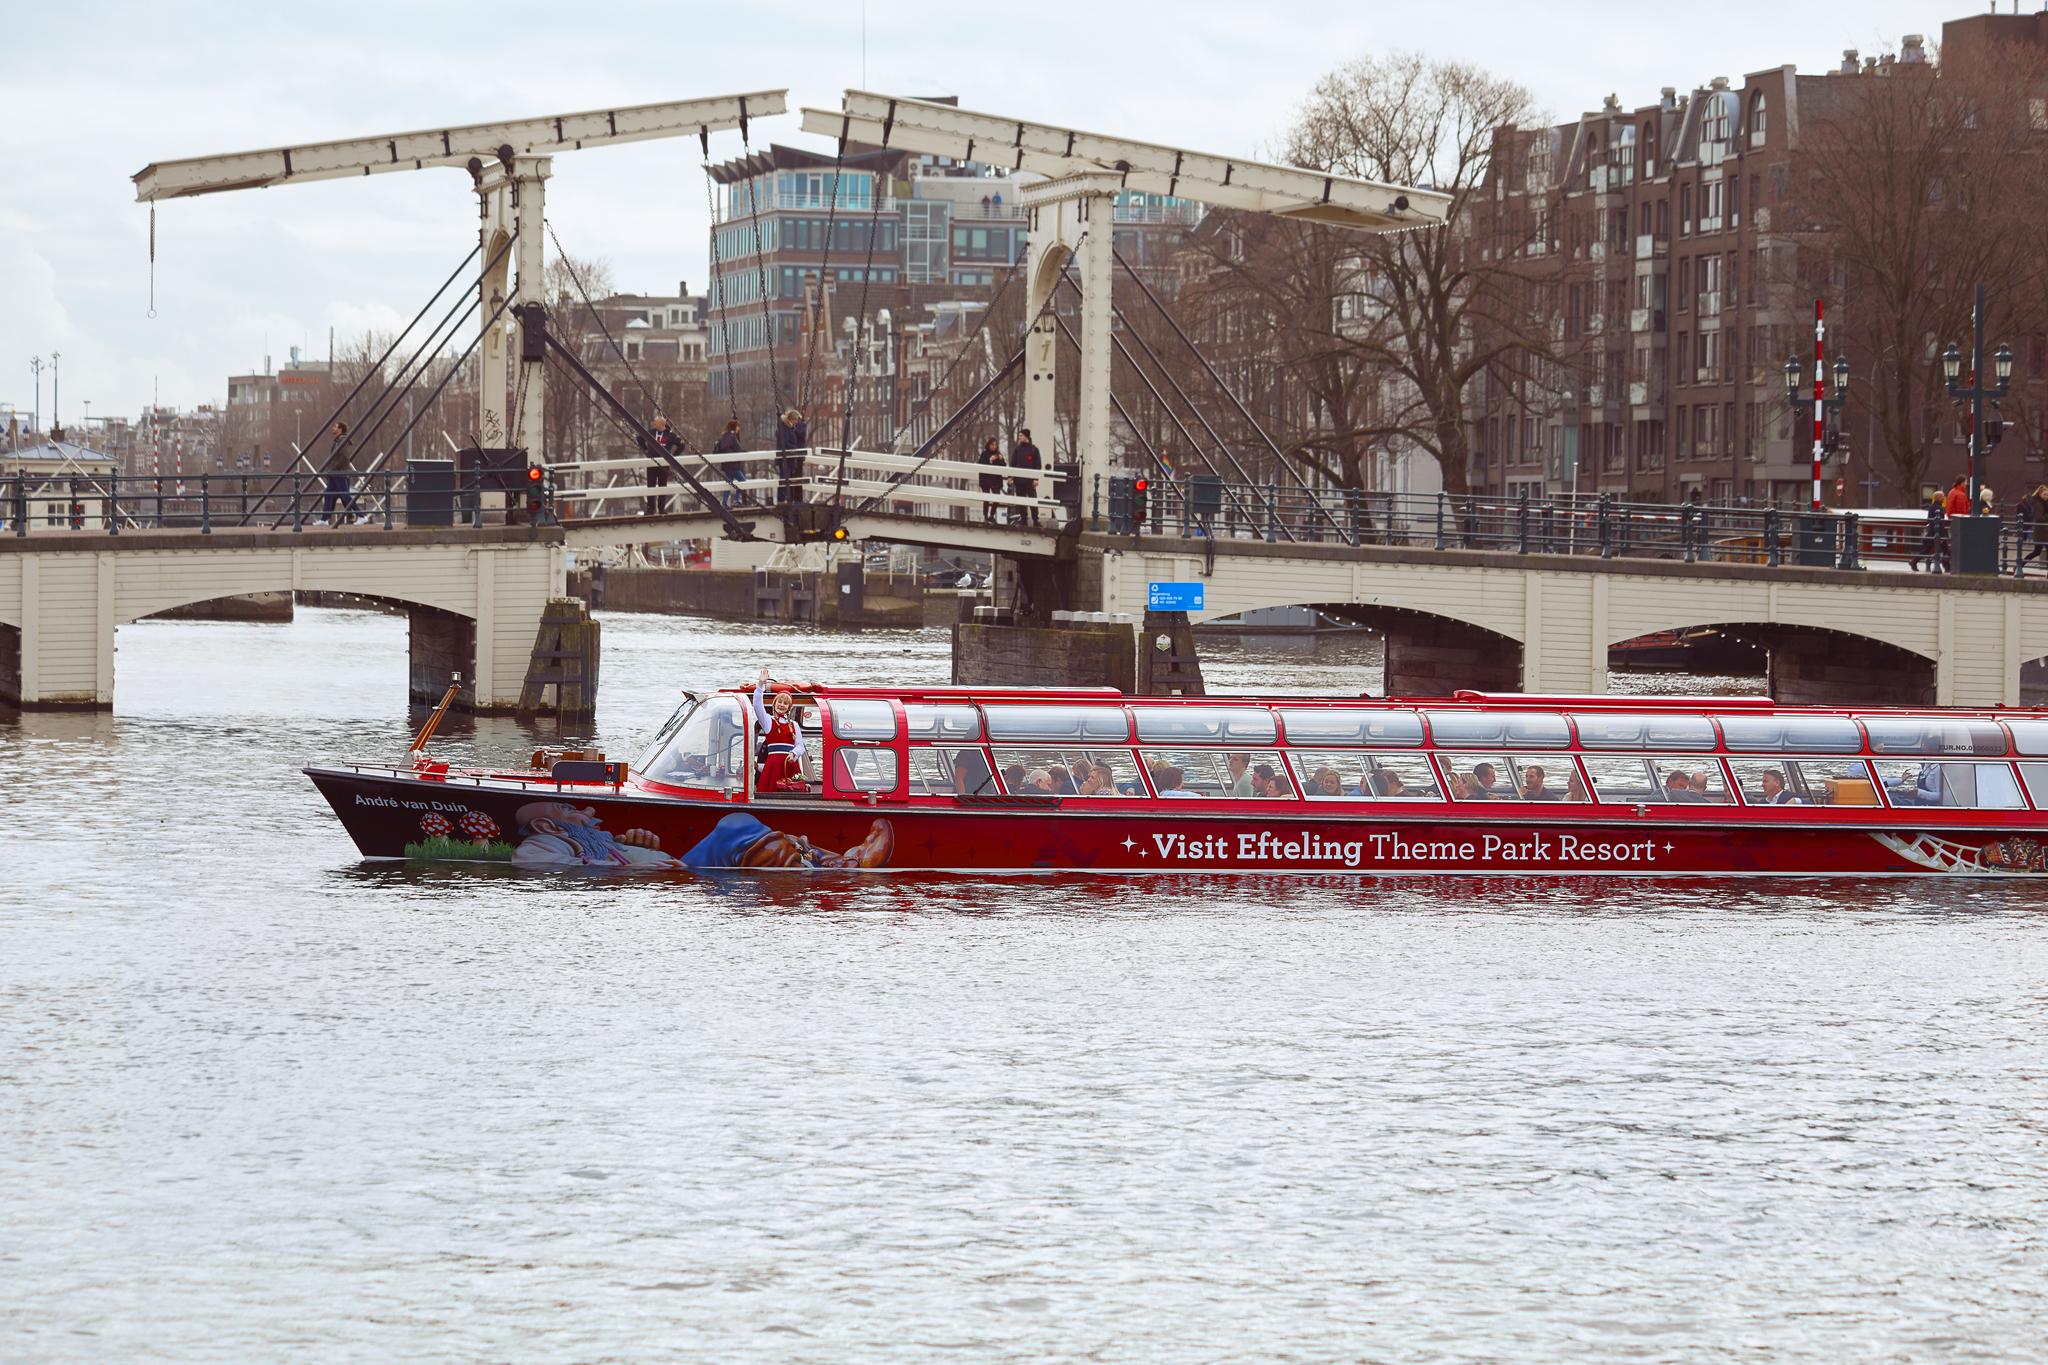 De Efteling rondvaartboot in Amsterdam